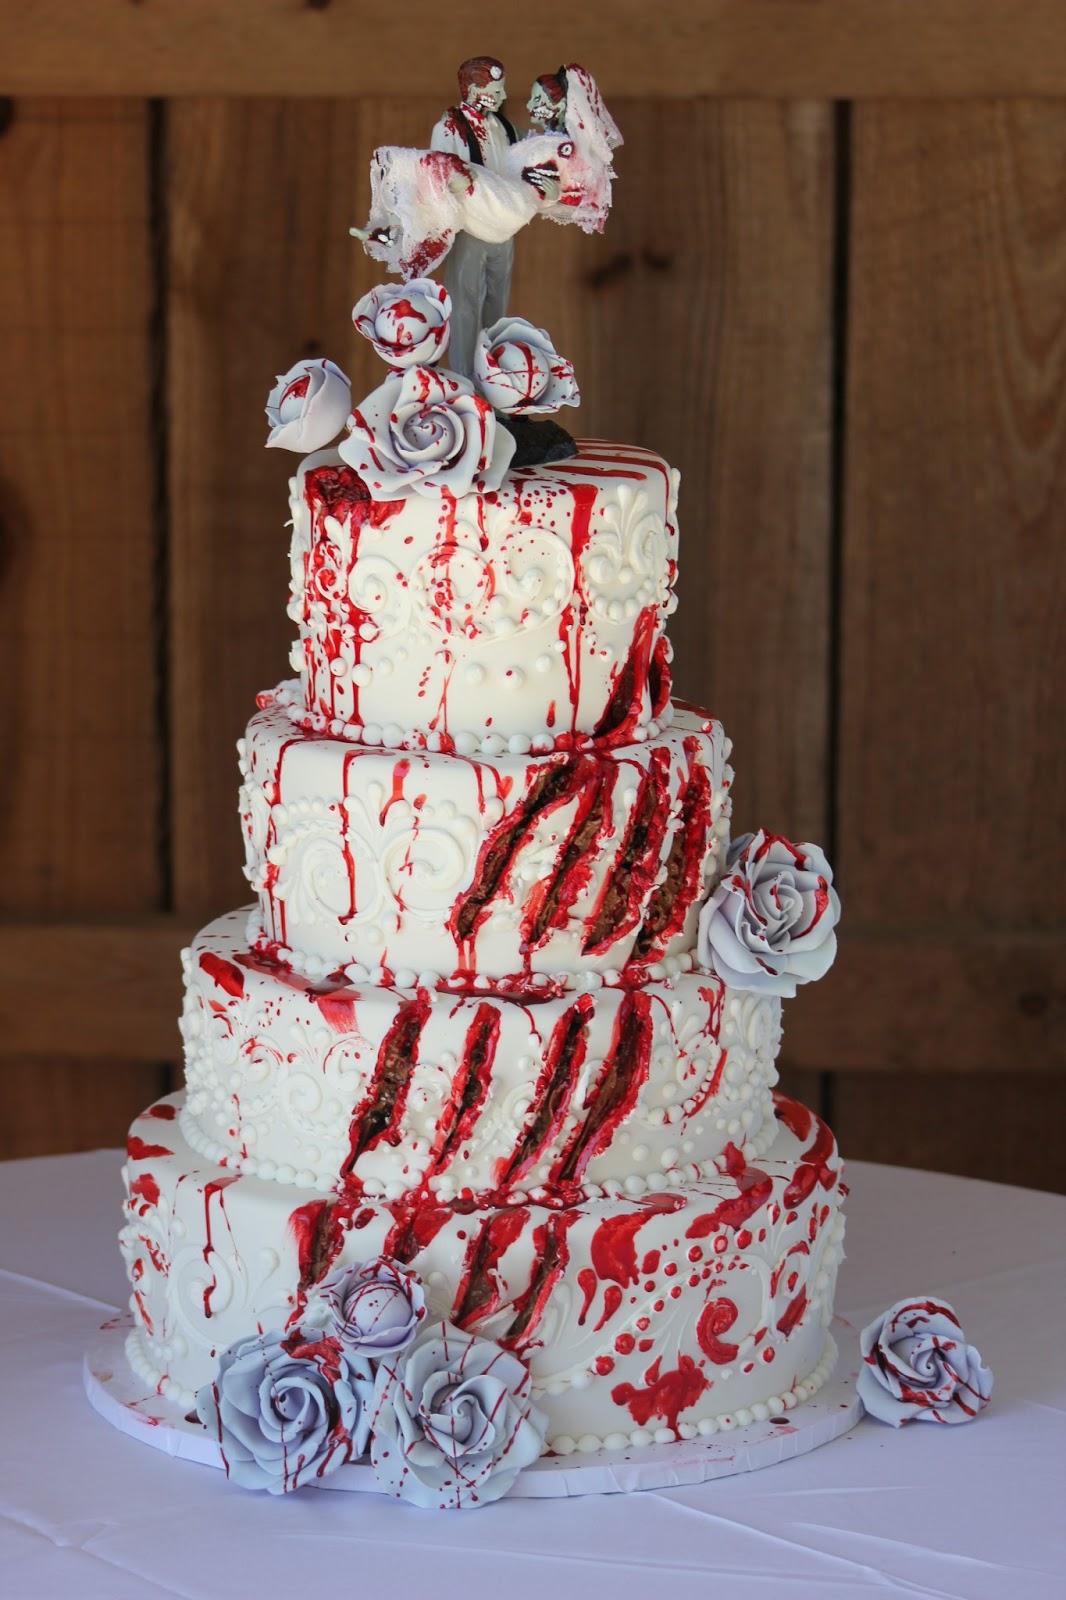 Zombie Gory Cake